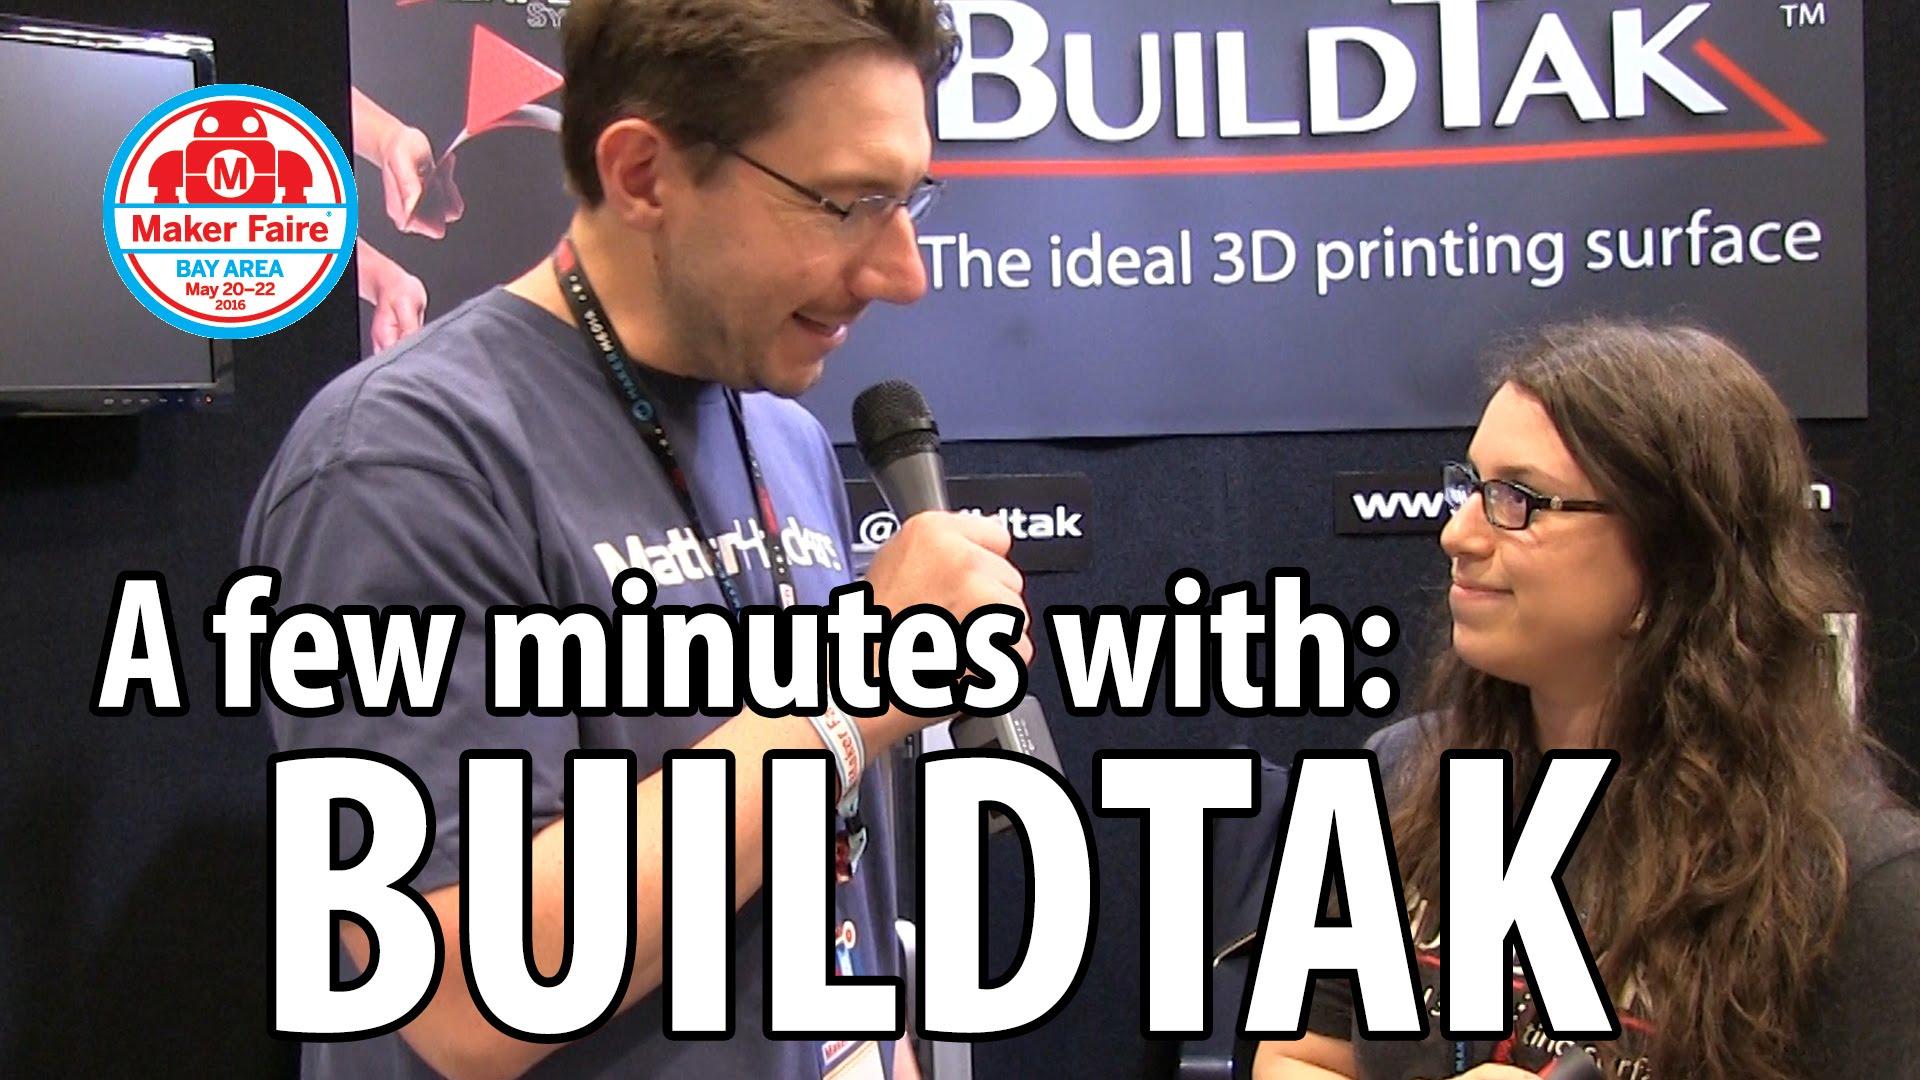 3D Printing: BuildTak at Maker Faire 2016